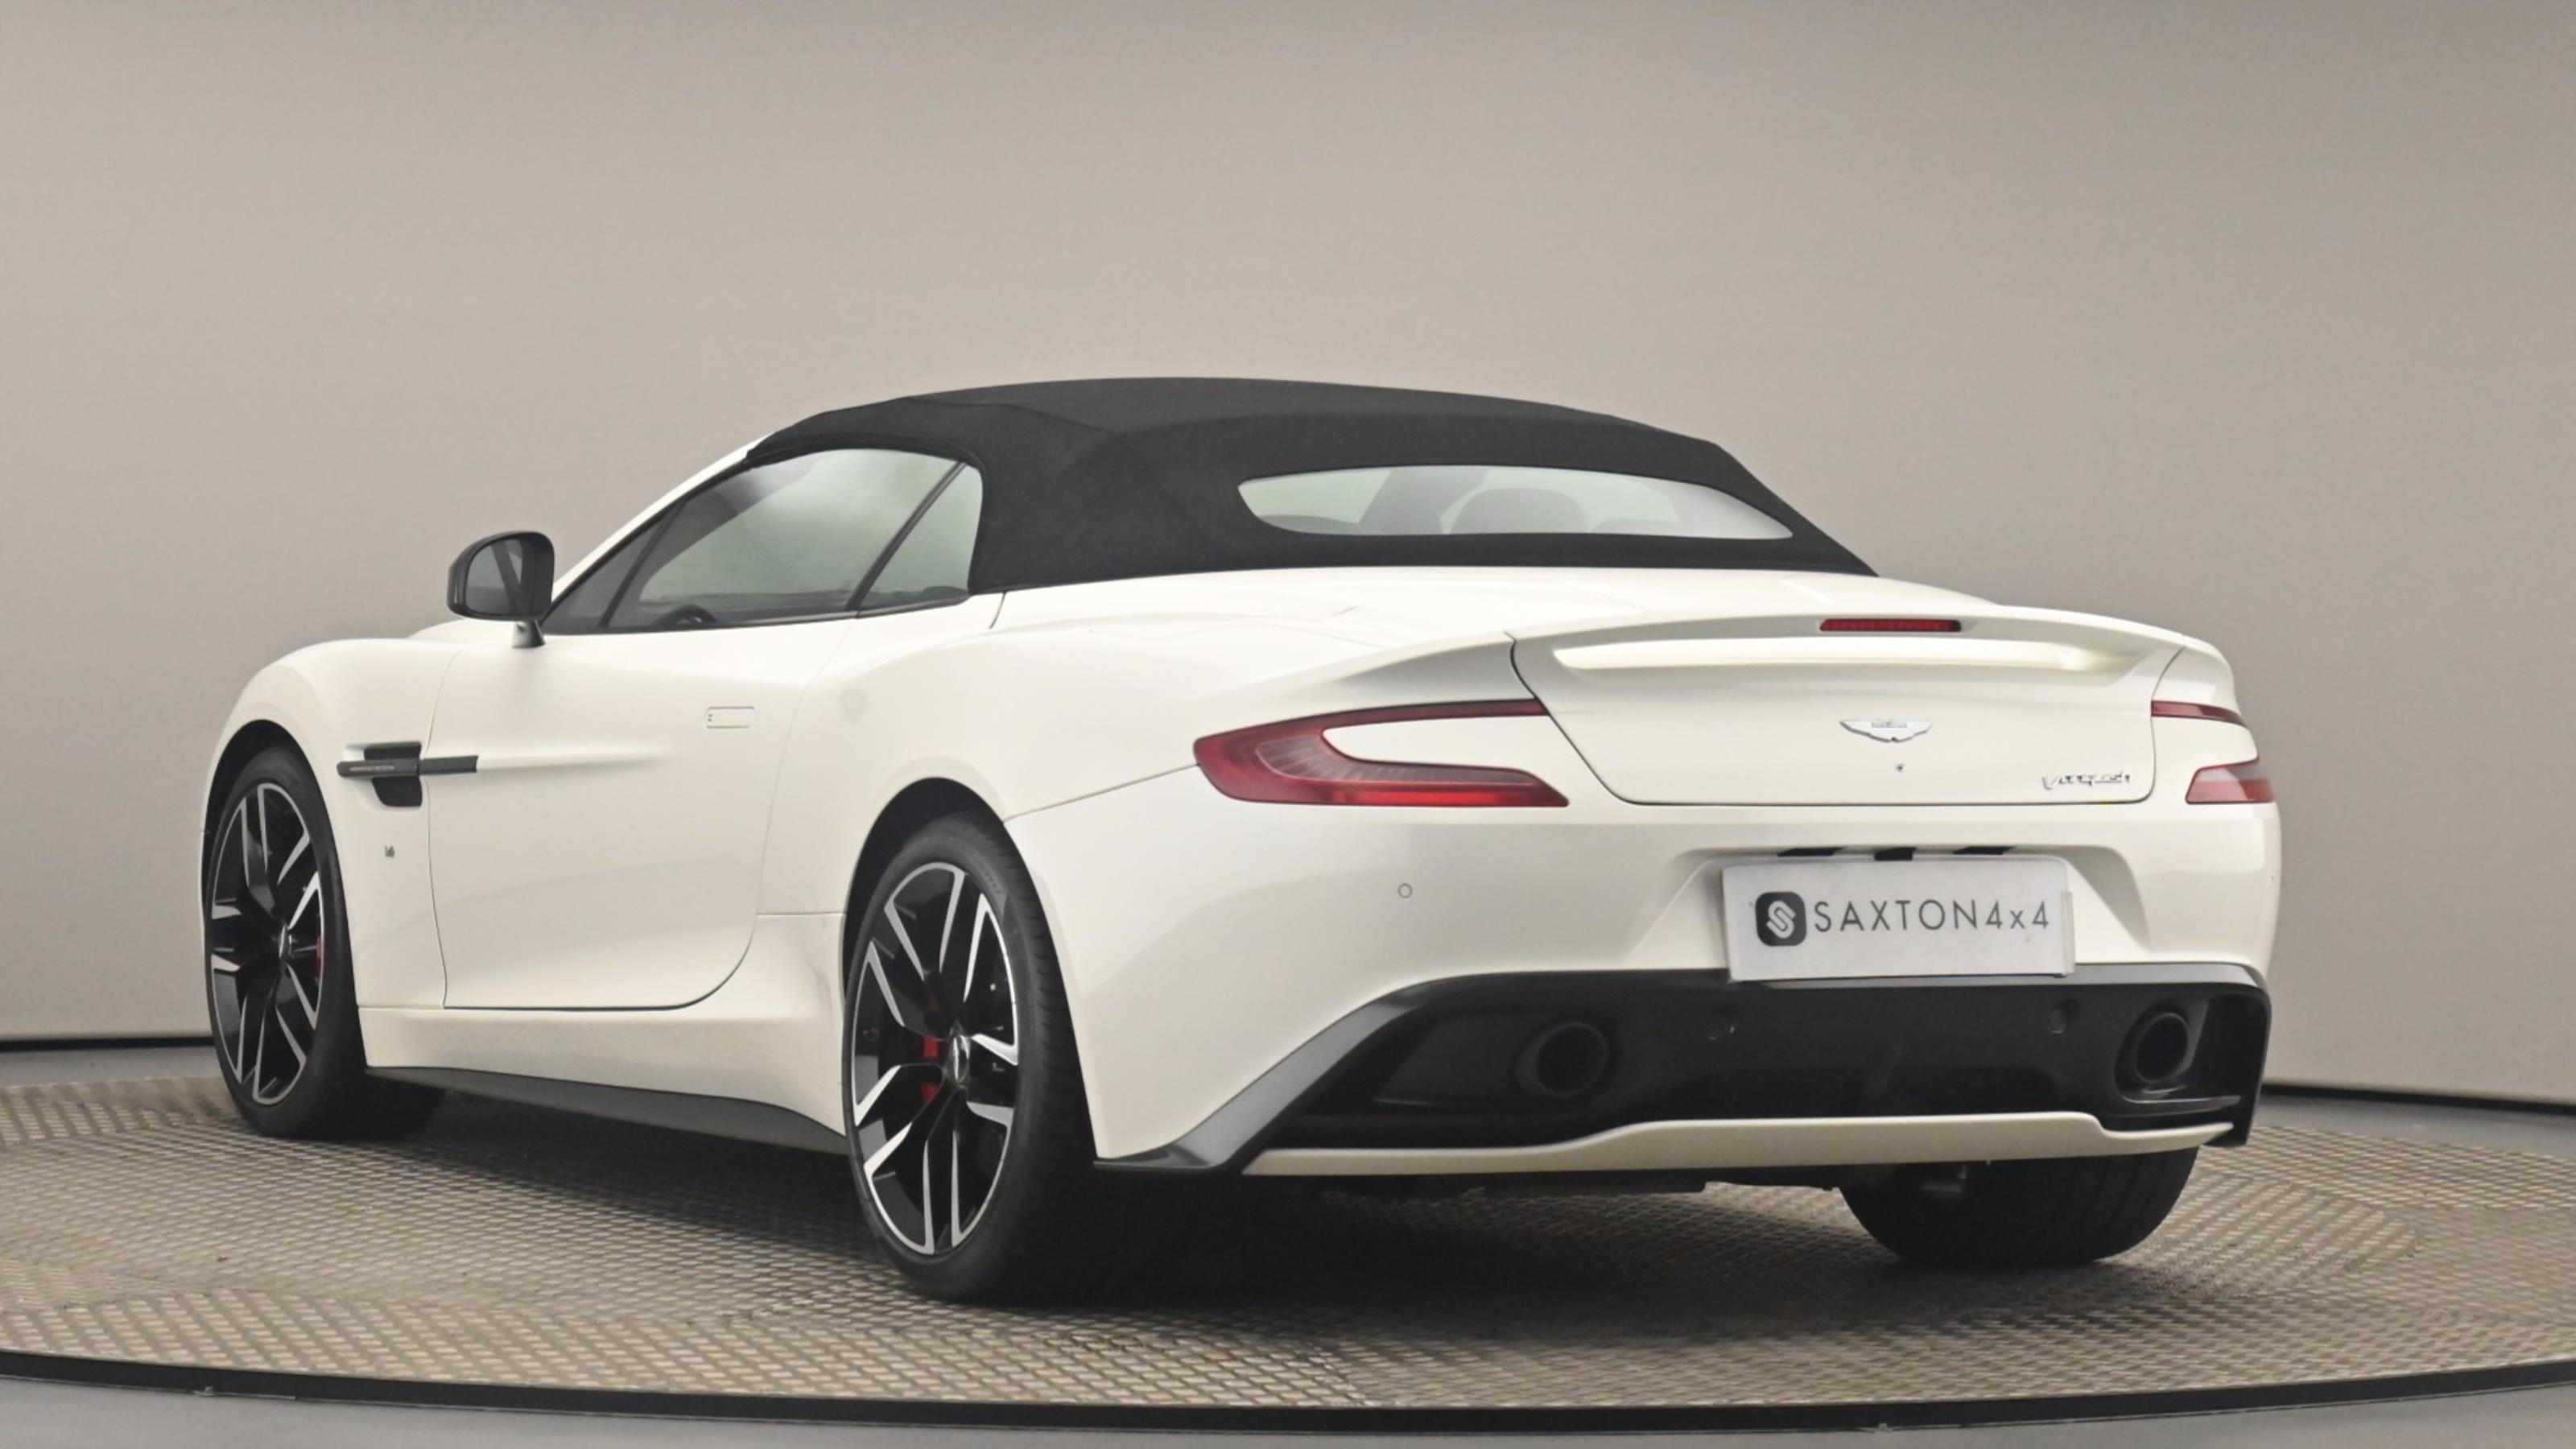 Used 2017 Aston Martin VANQUISH V12 [568] 2dr Volante Touchtronic Auto WHITE at Saxton4x4